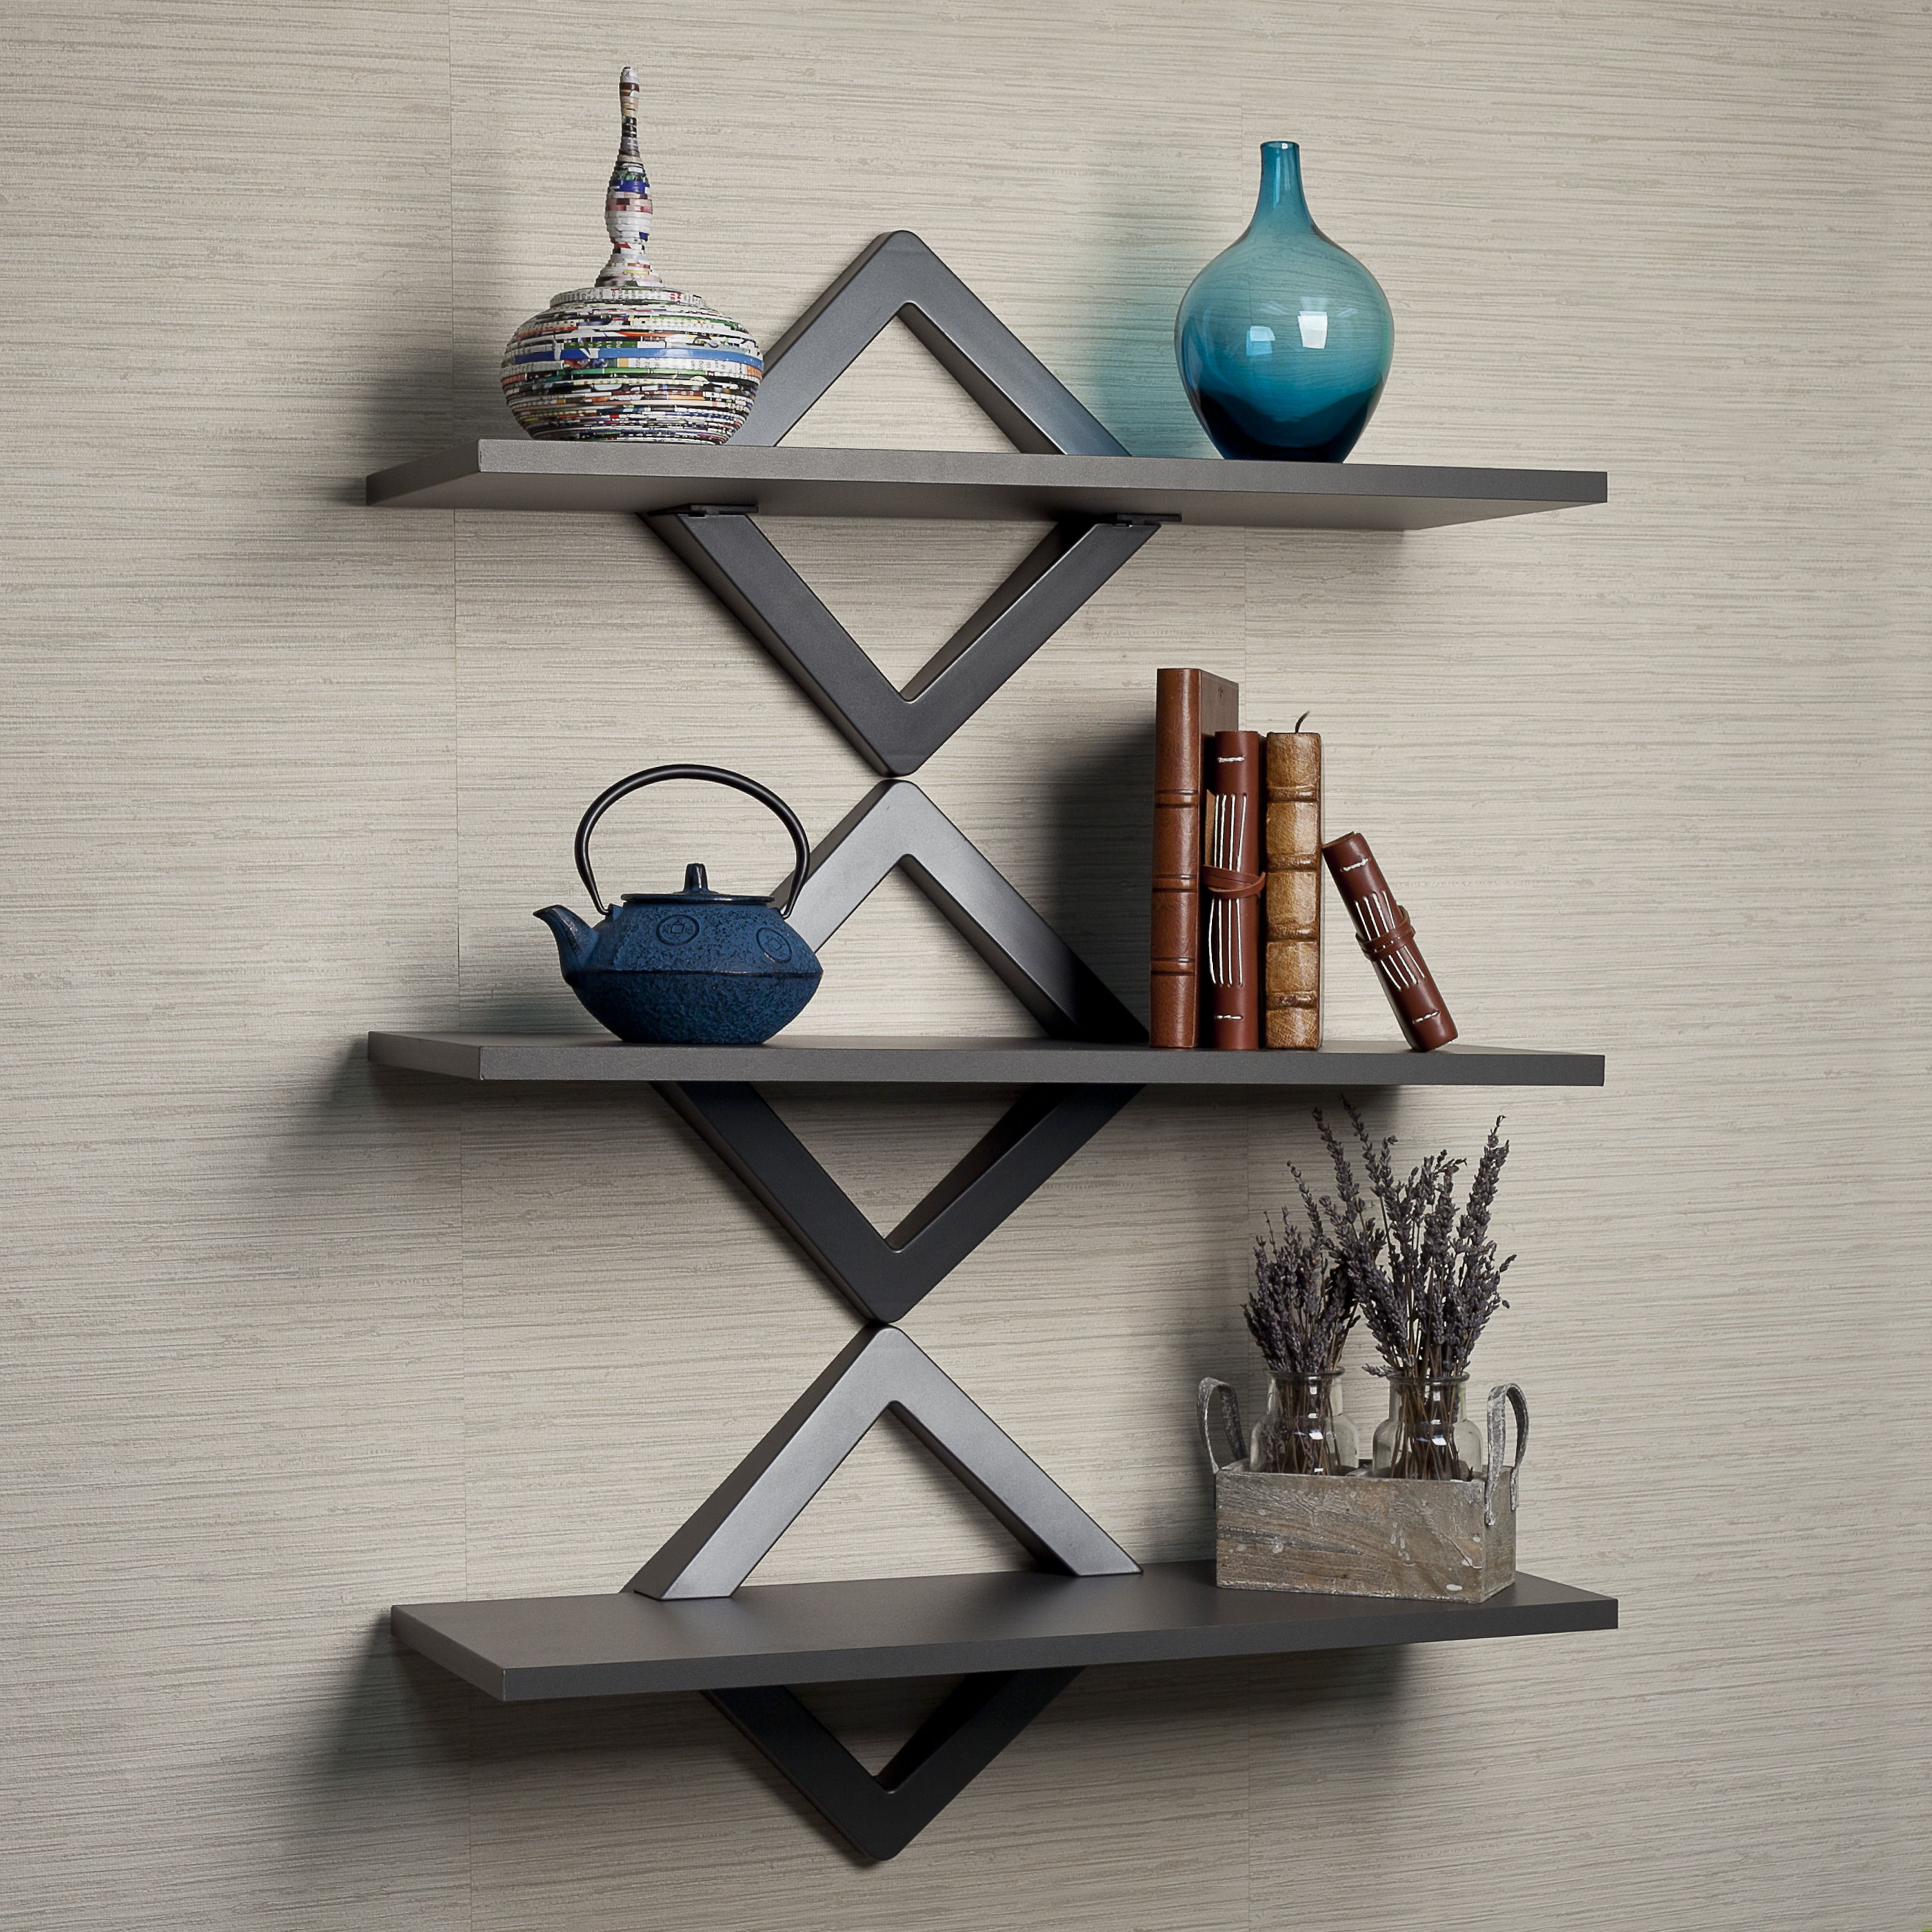 Danya b diamonds 3 level wall shelf home decor pinterest danya b diamonds 3 level wall shelf amipublicfo Images